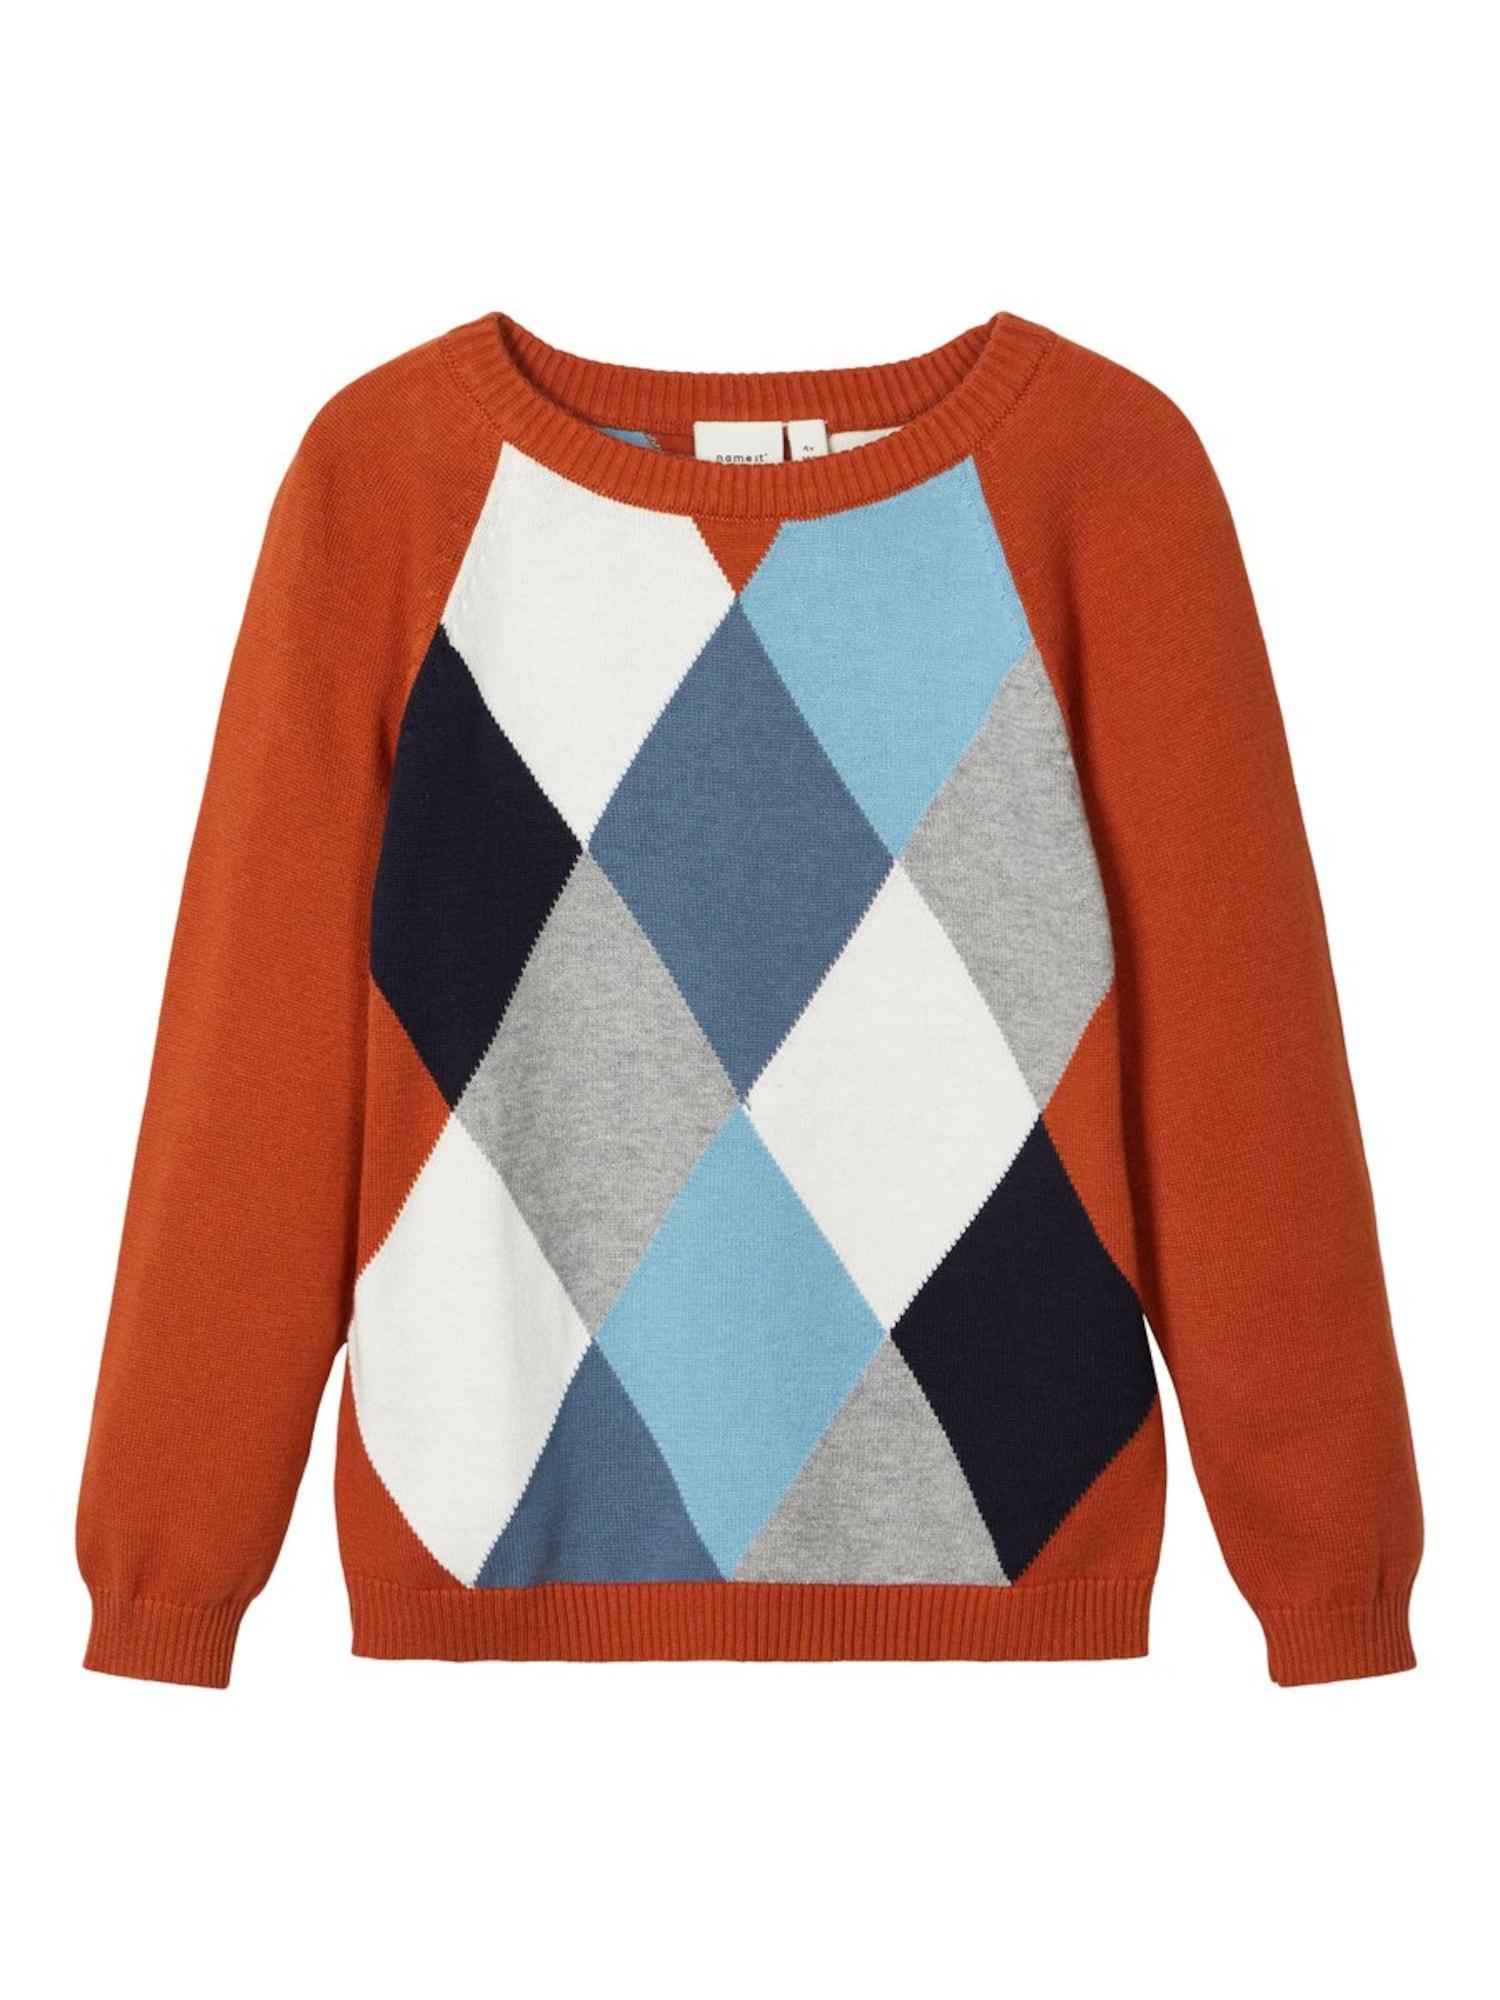 Miniboyoberteile - Pullover 'Harlekin' - Onlineshop ABOUT YOU